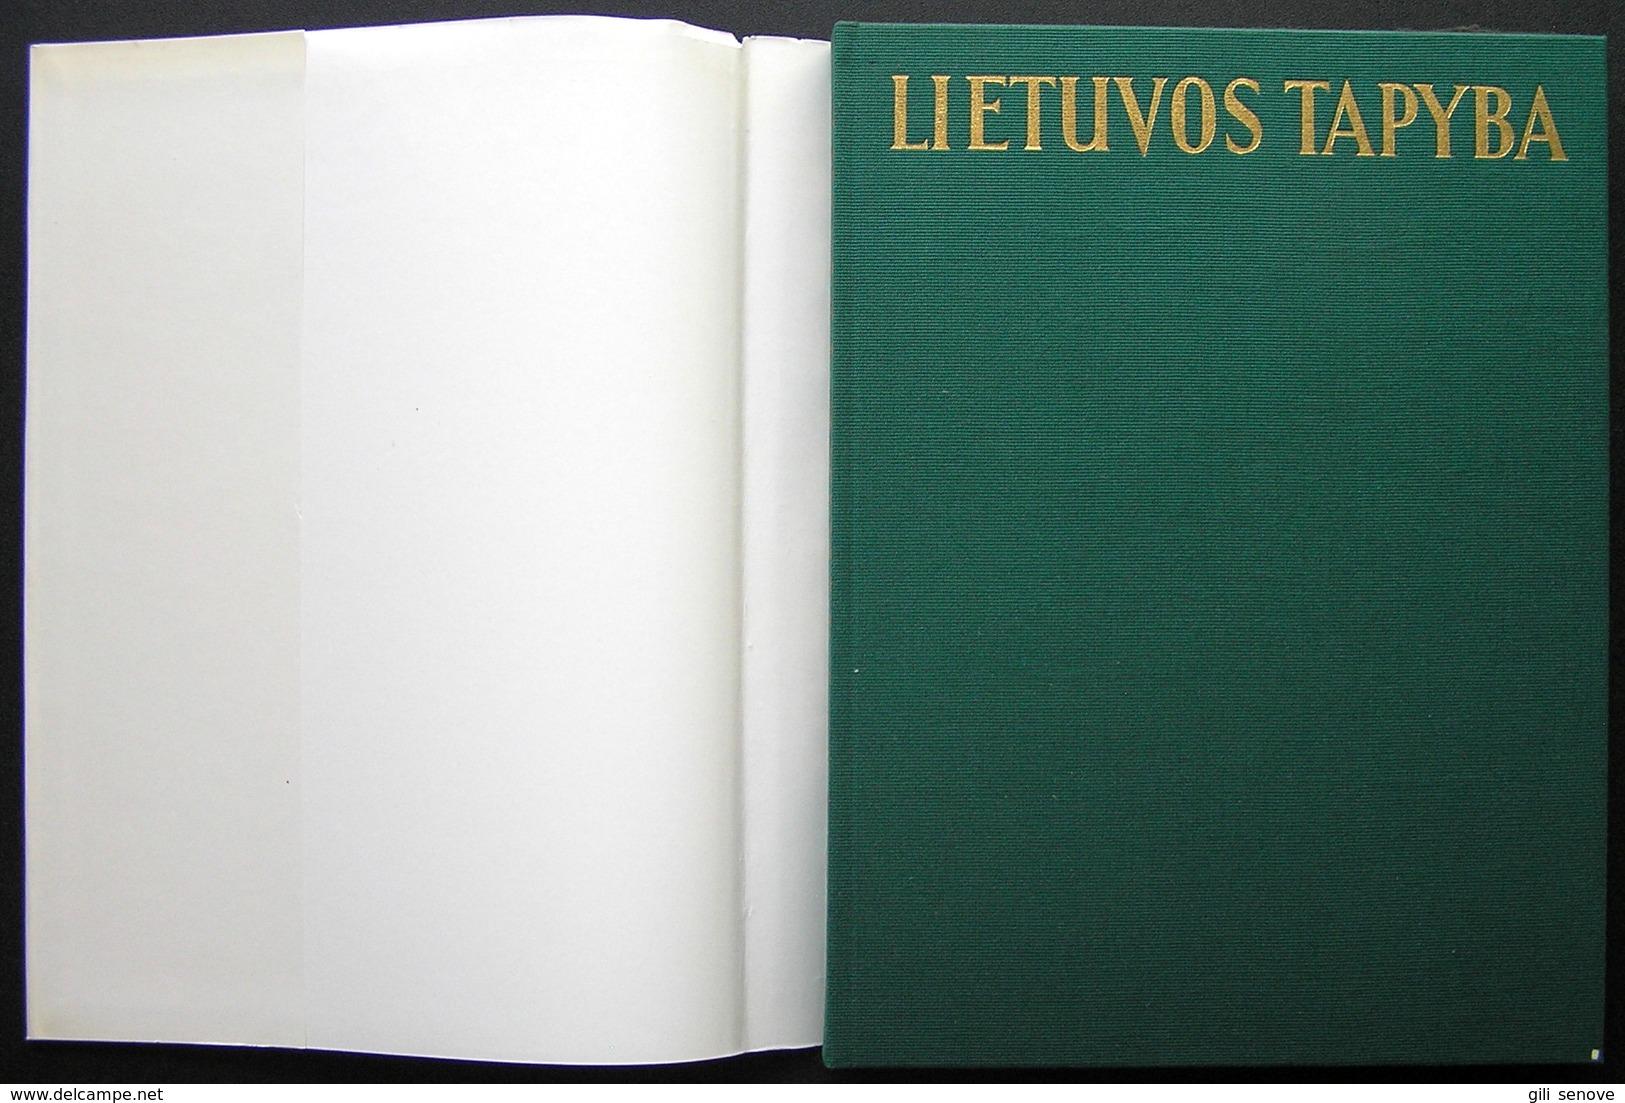 Lithuanian Book / Lithuanian Painting Lietuvos Tapyba Album 1983 - Kultur